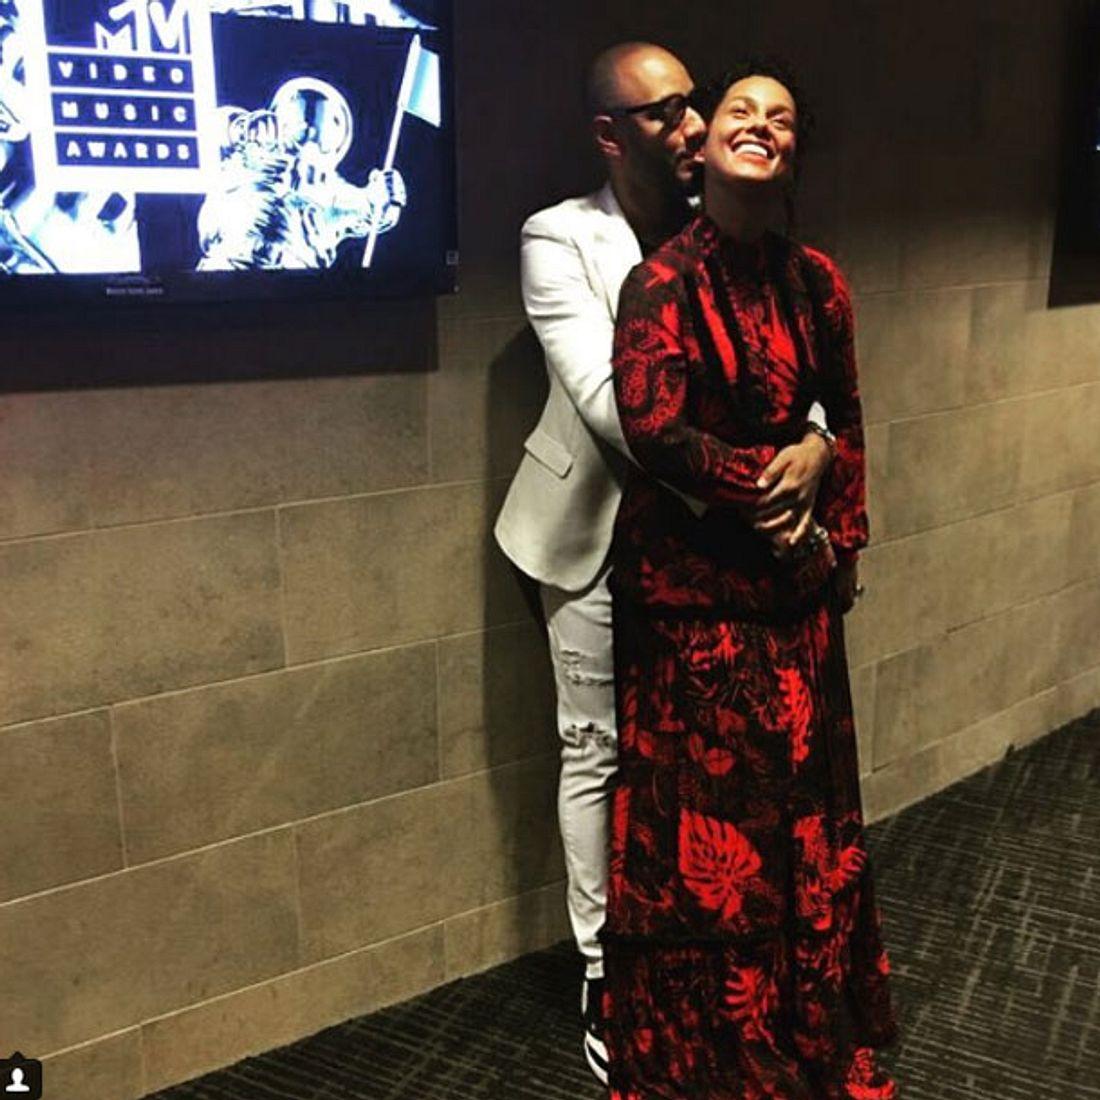 Ist Alicia Keys schwanger?